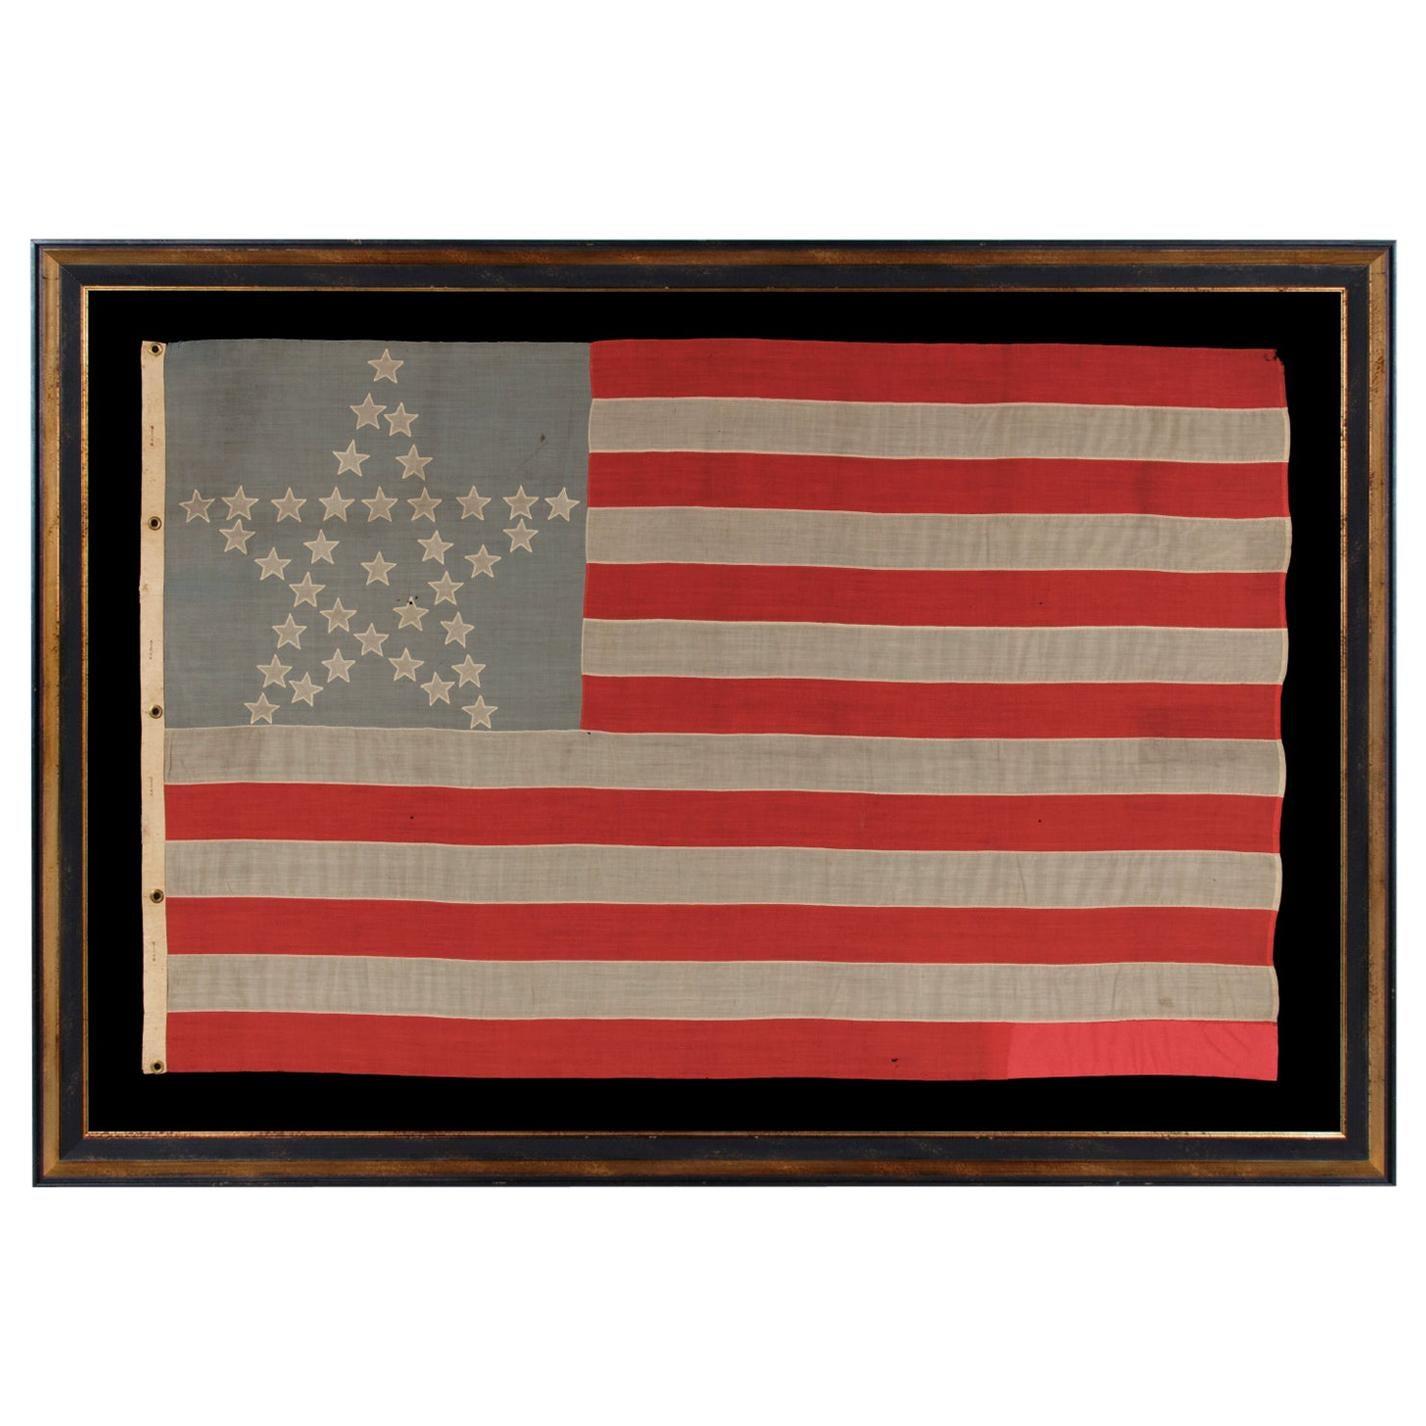 36 Star American Flag, Civil War Era, Nevada Statehood